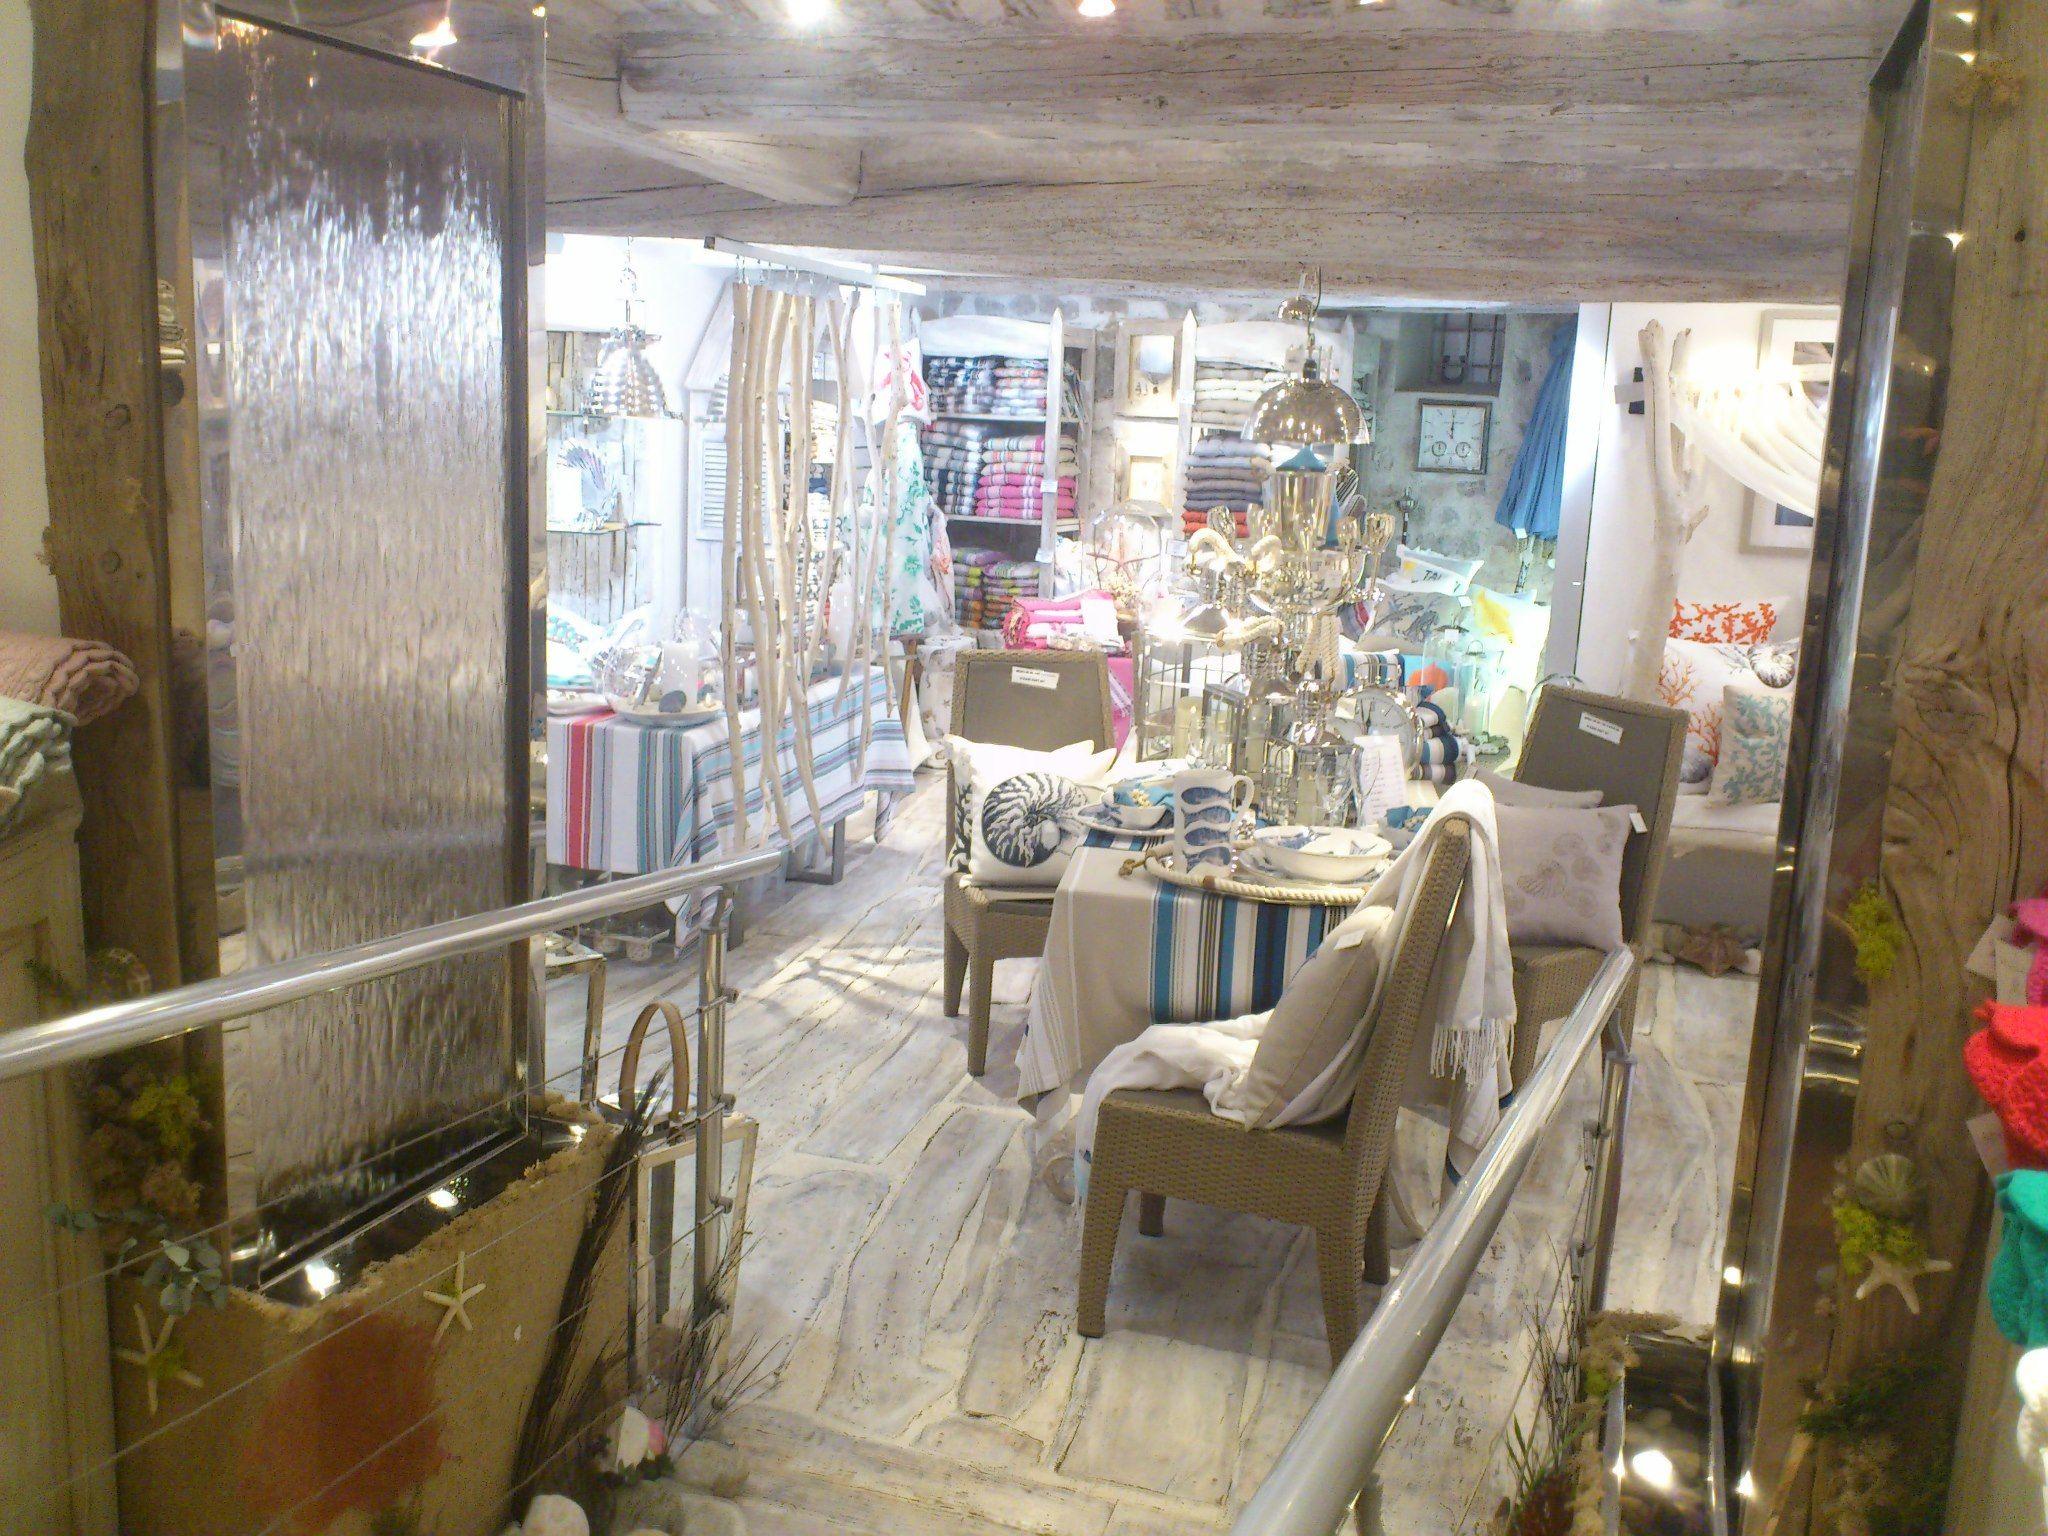 collection marinette saint tropez elegant marinette saint tropez decoration linge maison lit. Black Bedroom Furniture Sets. Home Design Ideas